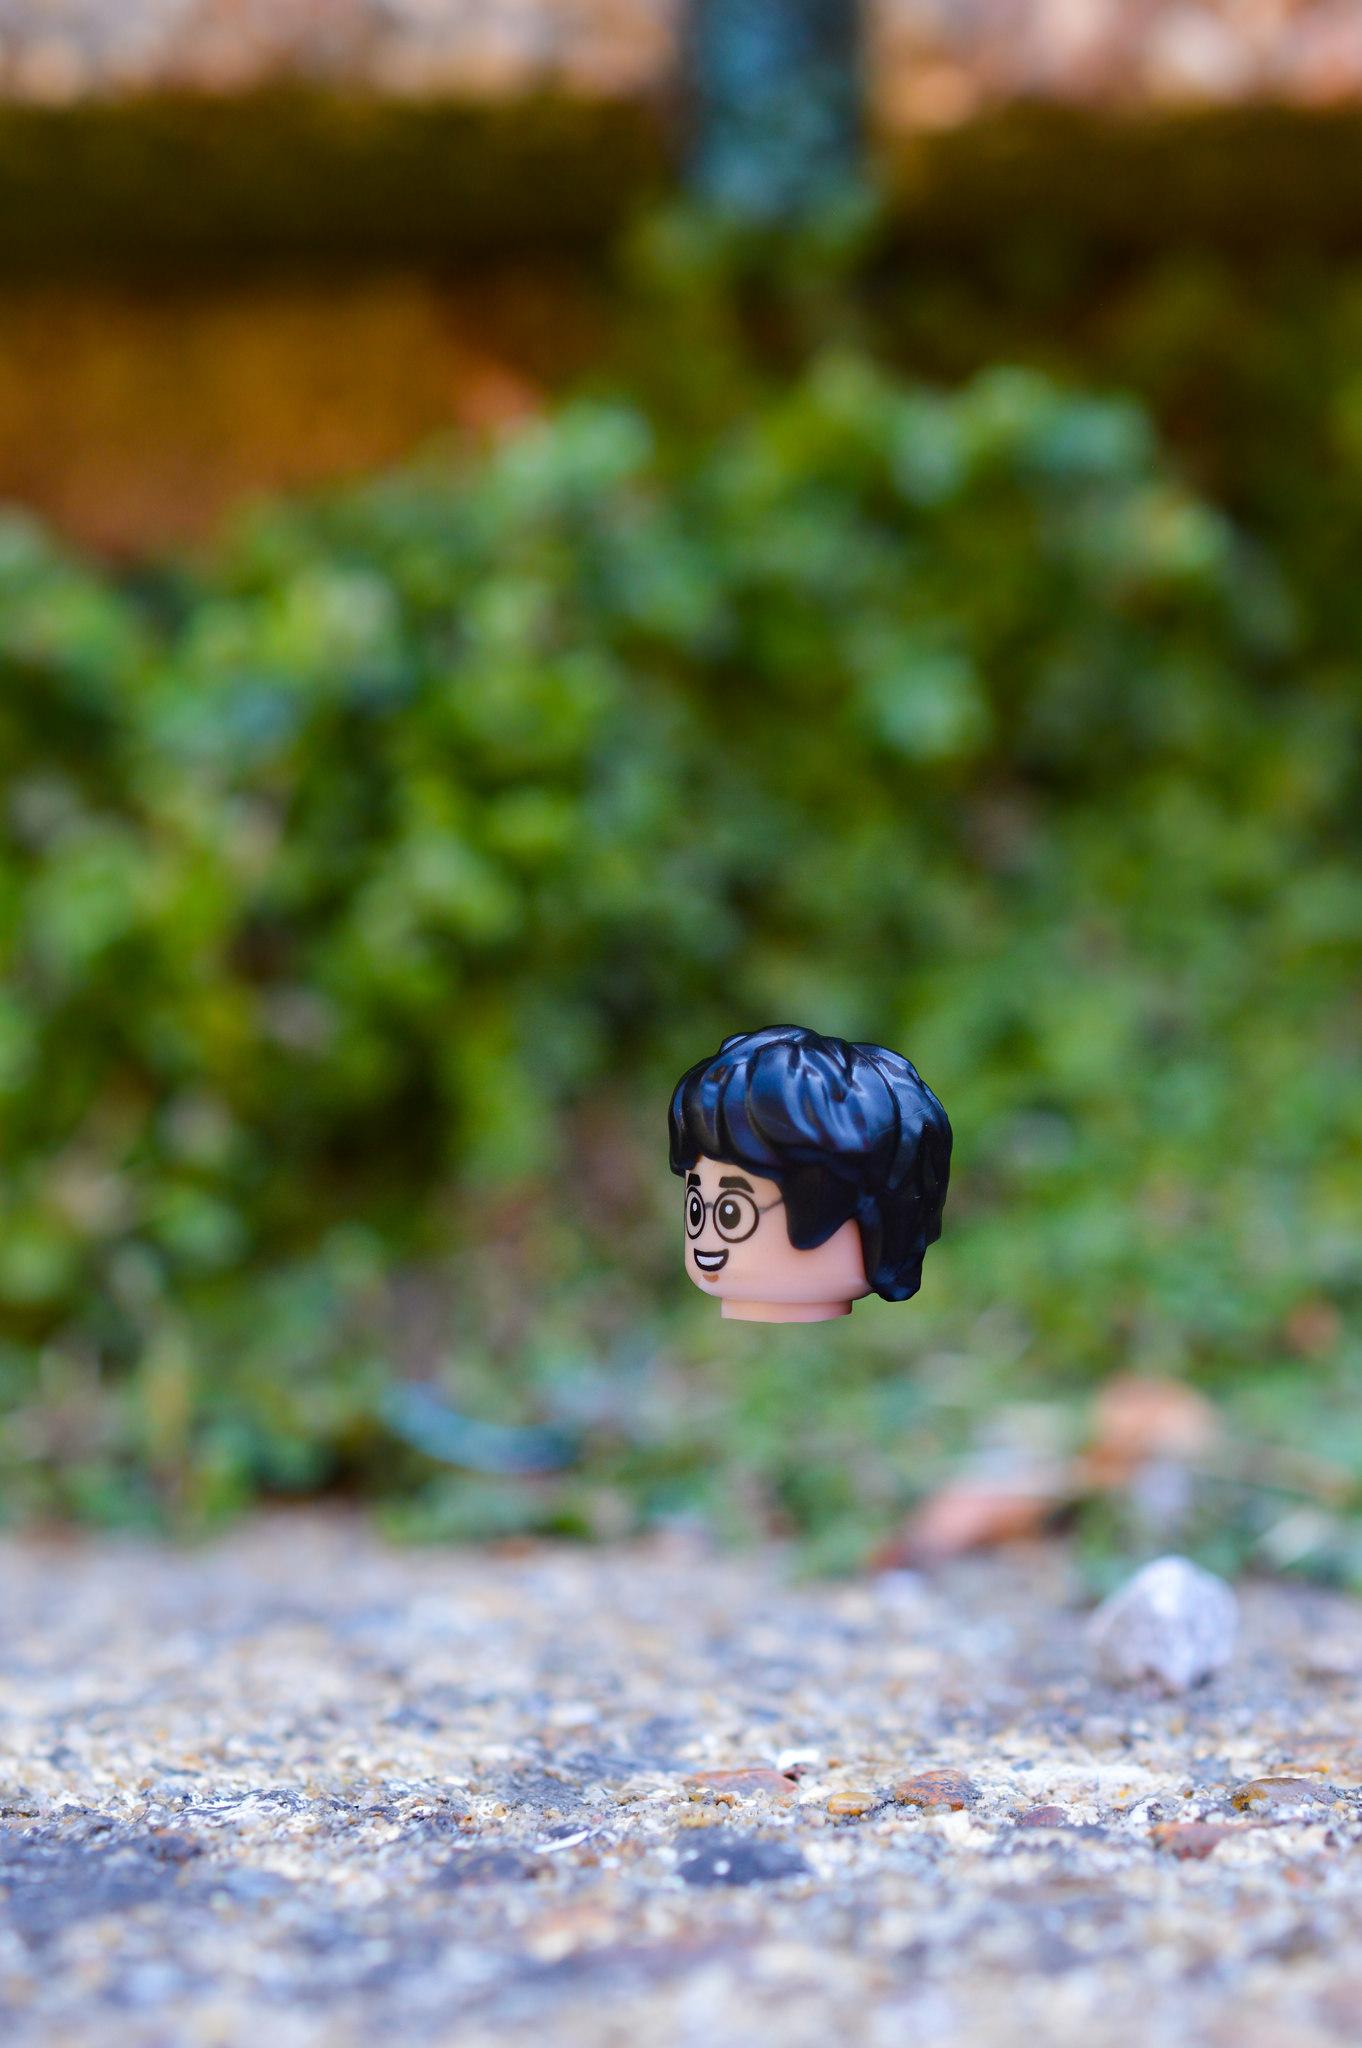 LEGO Harry Potter head, floating